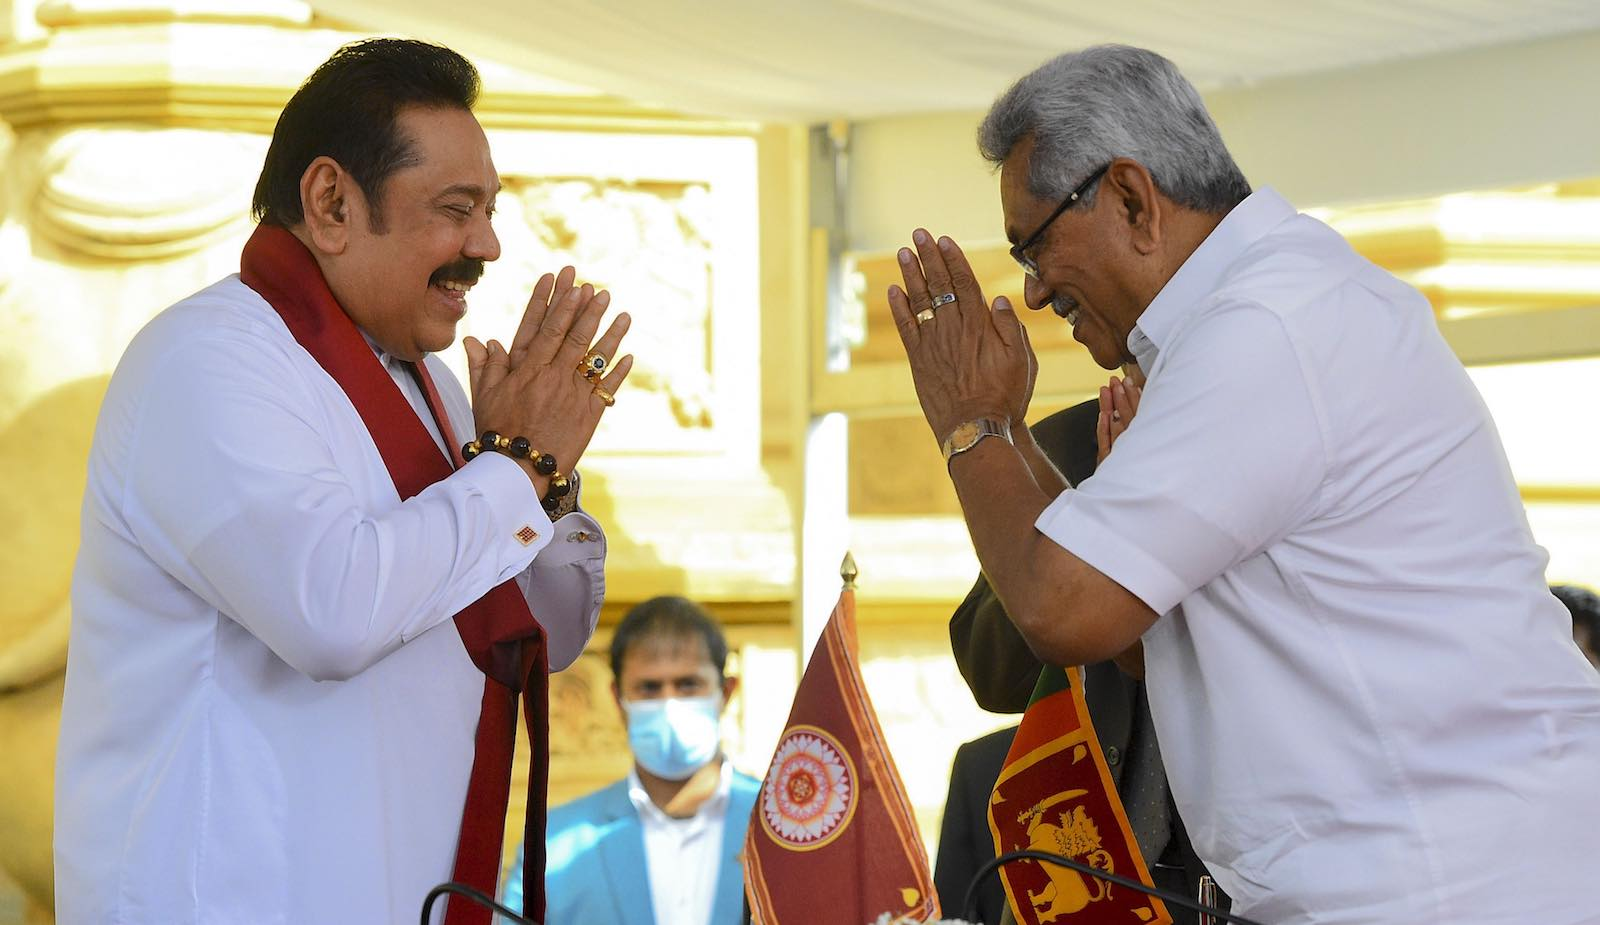 Sri Lanka's President Gotabaya Rajapaksa (right) swears in his brother and former president Mahinda Rajapaksa as Sri Lanka's new Prime Minister (Ishara S. Kodikara/AFP via Getty Images)